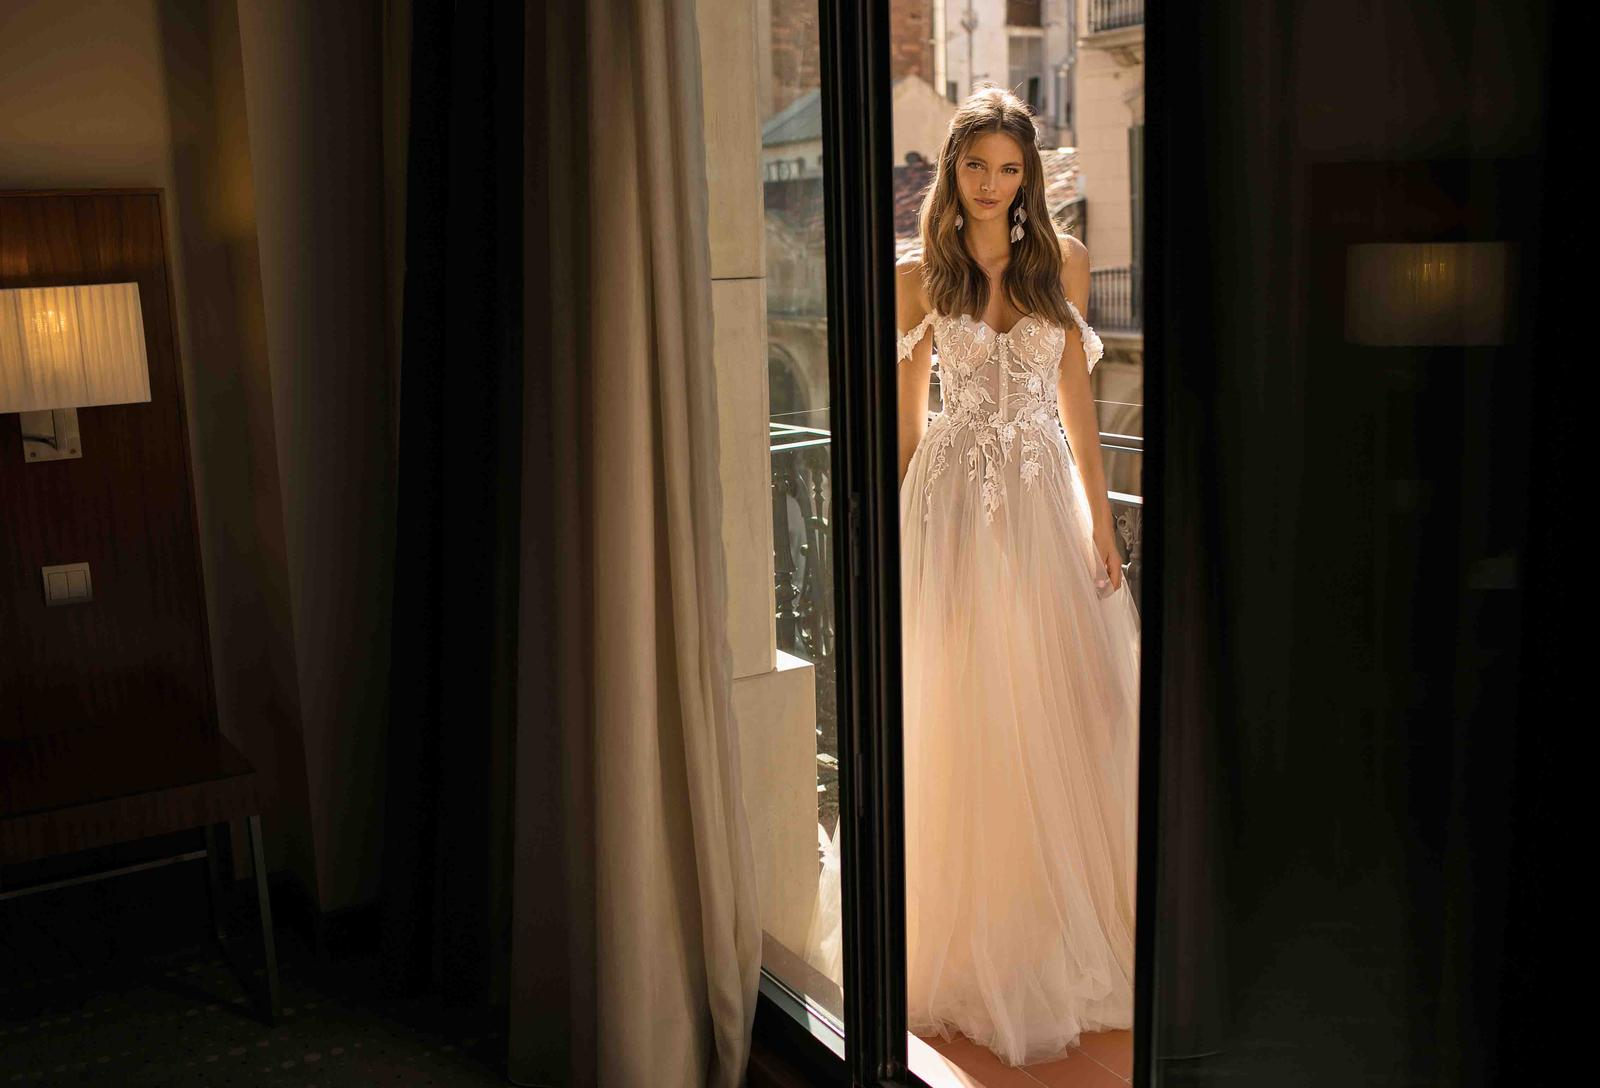 Muse by Berta * Svadobné šaty z kolekcií na rok 2019 - Obrázok č. 8